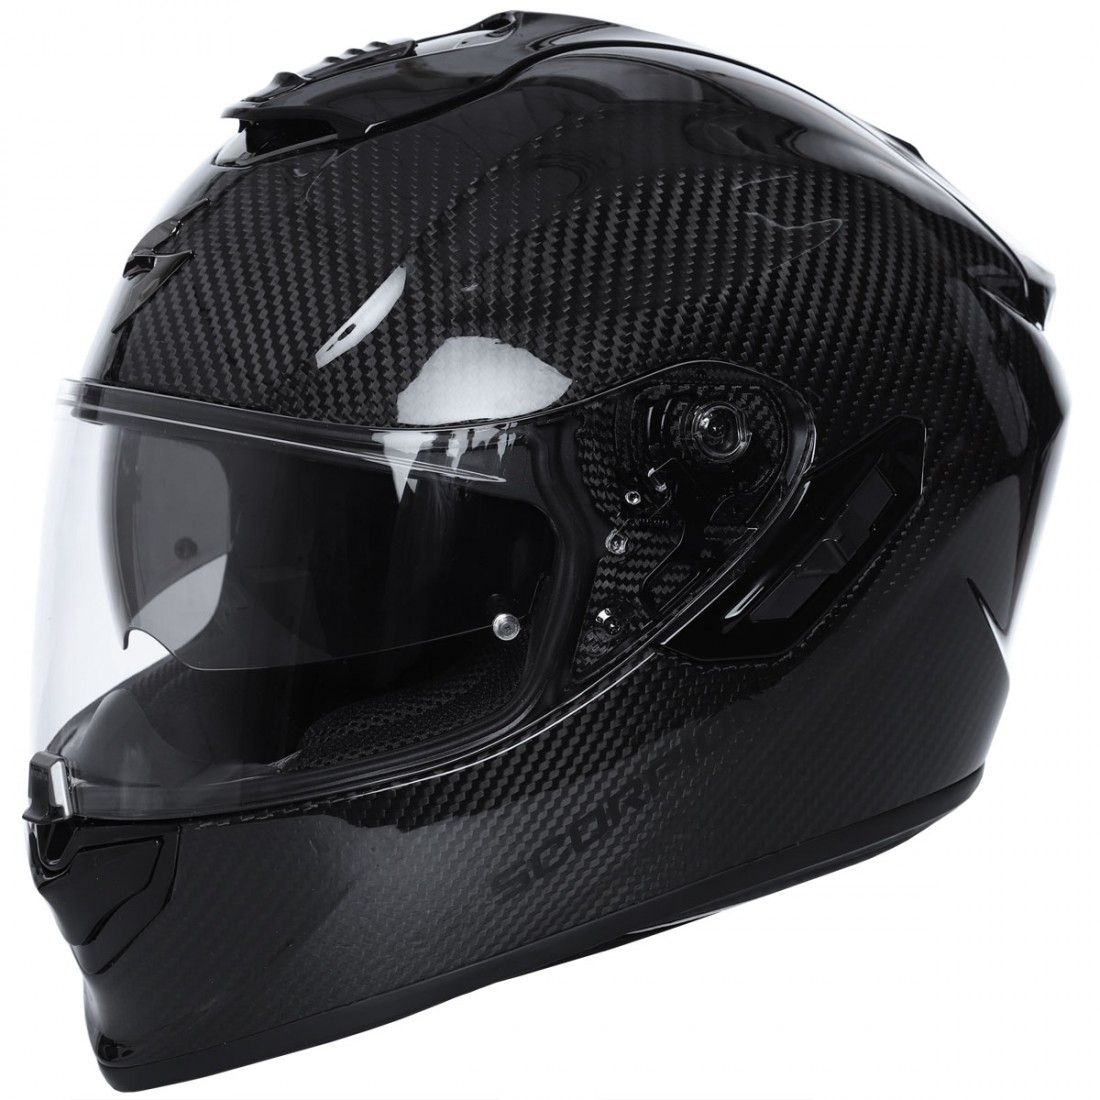 scorpion exo 1400 carbon air solid helmet motocard. Black Bedroom Furniture Sets. Home Design Ideas